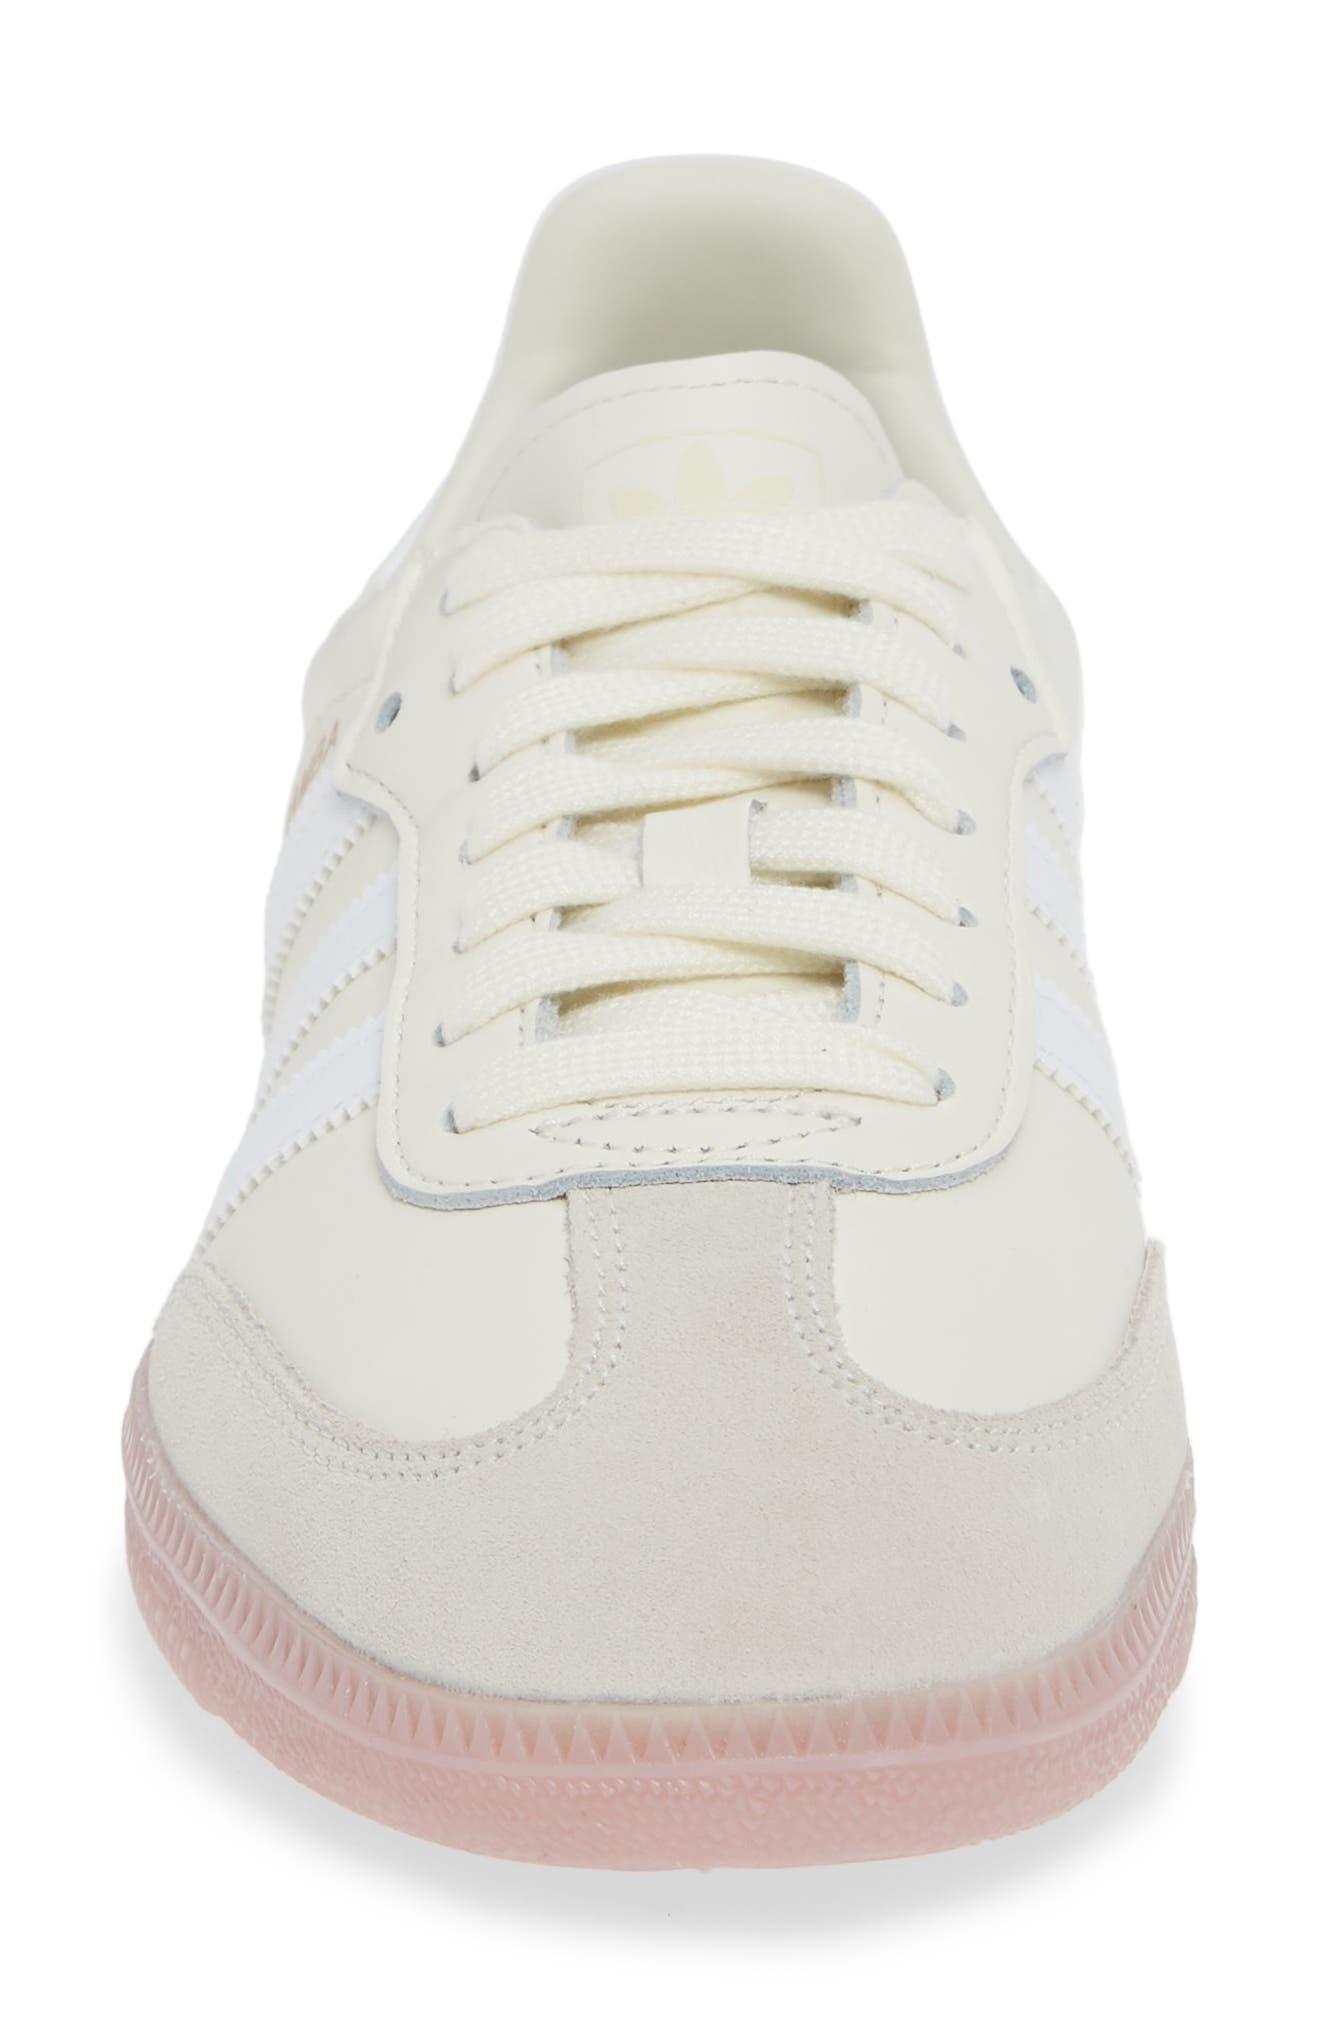 Samba Sneaker,                             Alternate thumbnail 4, color,                             OFF WHITE/ WHITE/ SOFT VISION